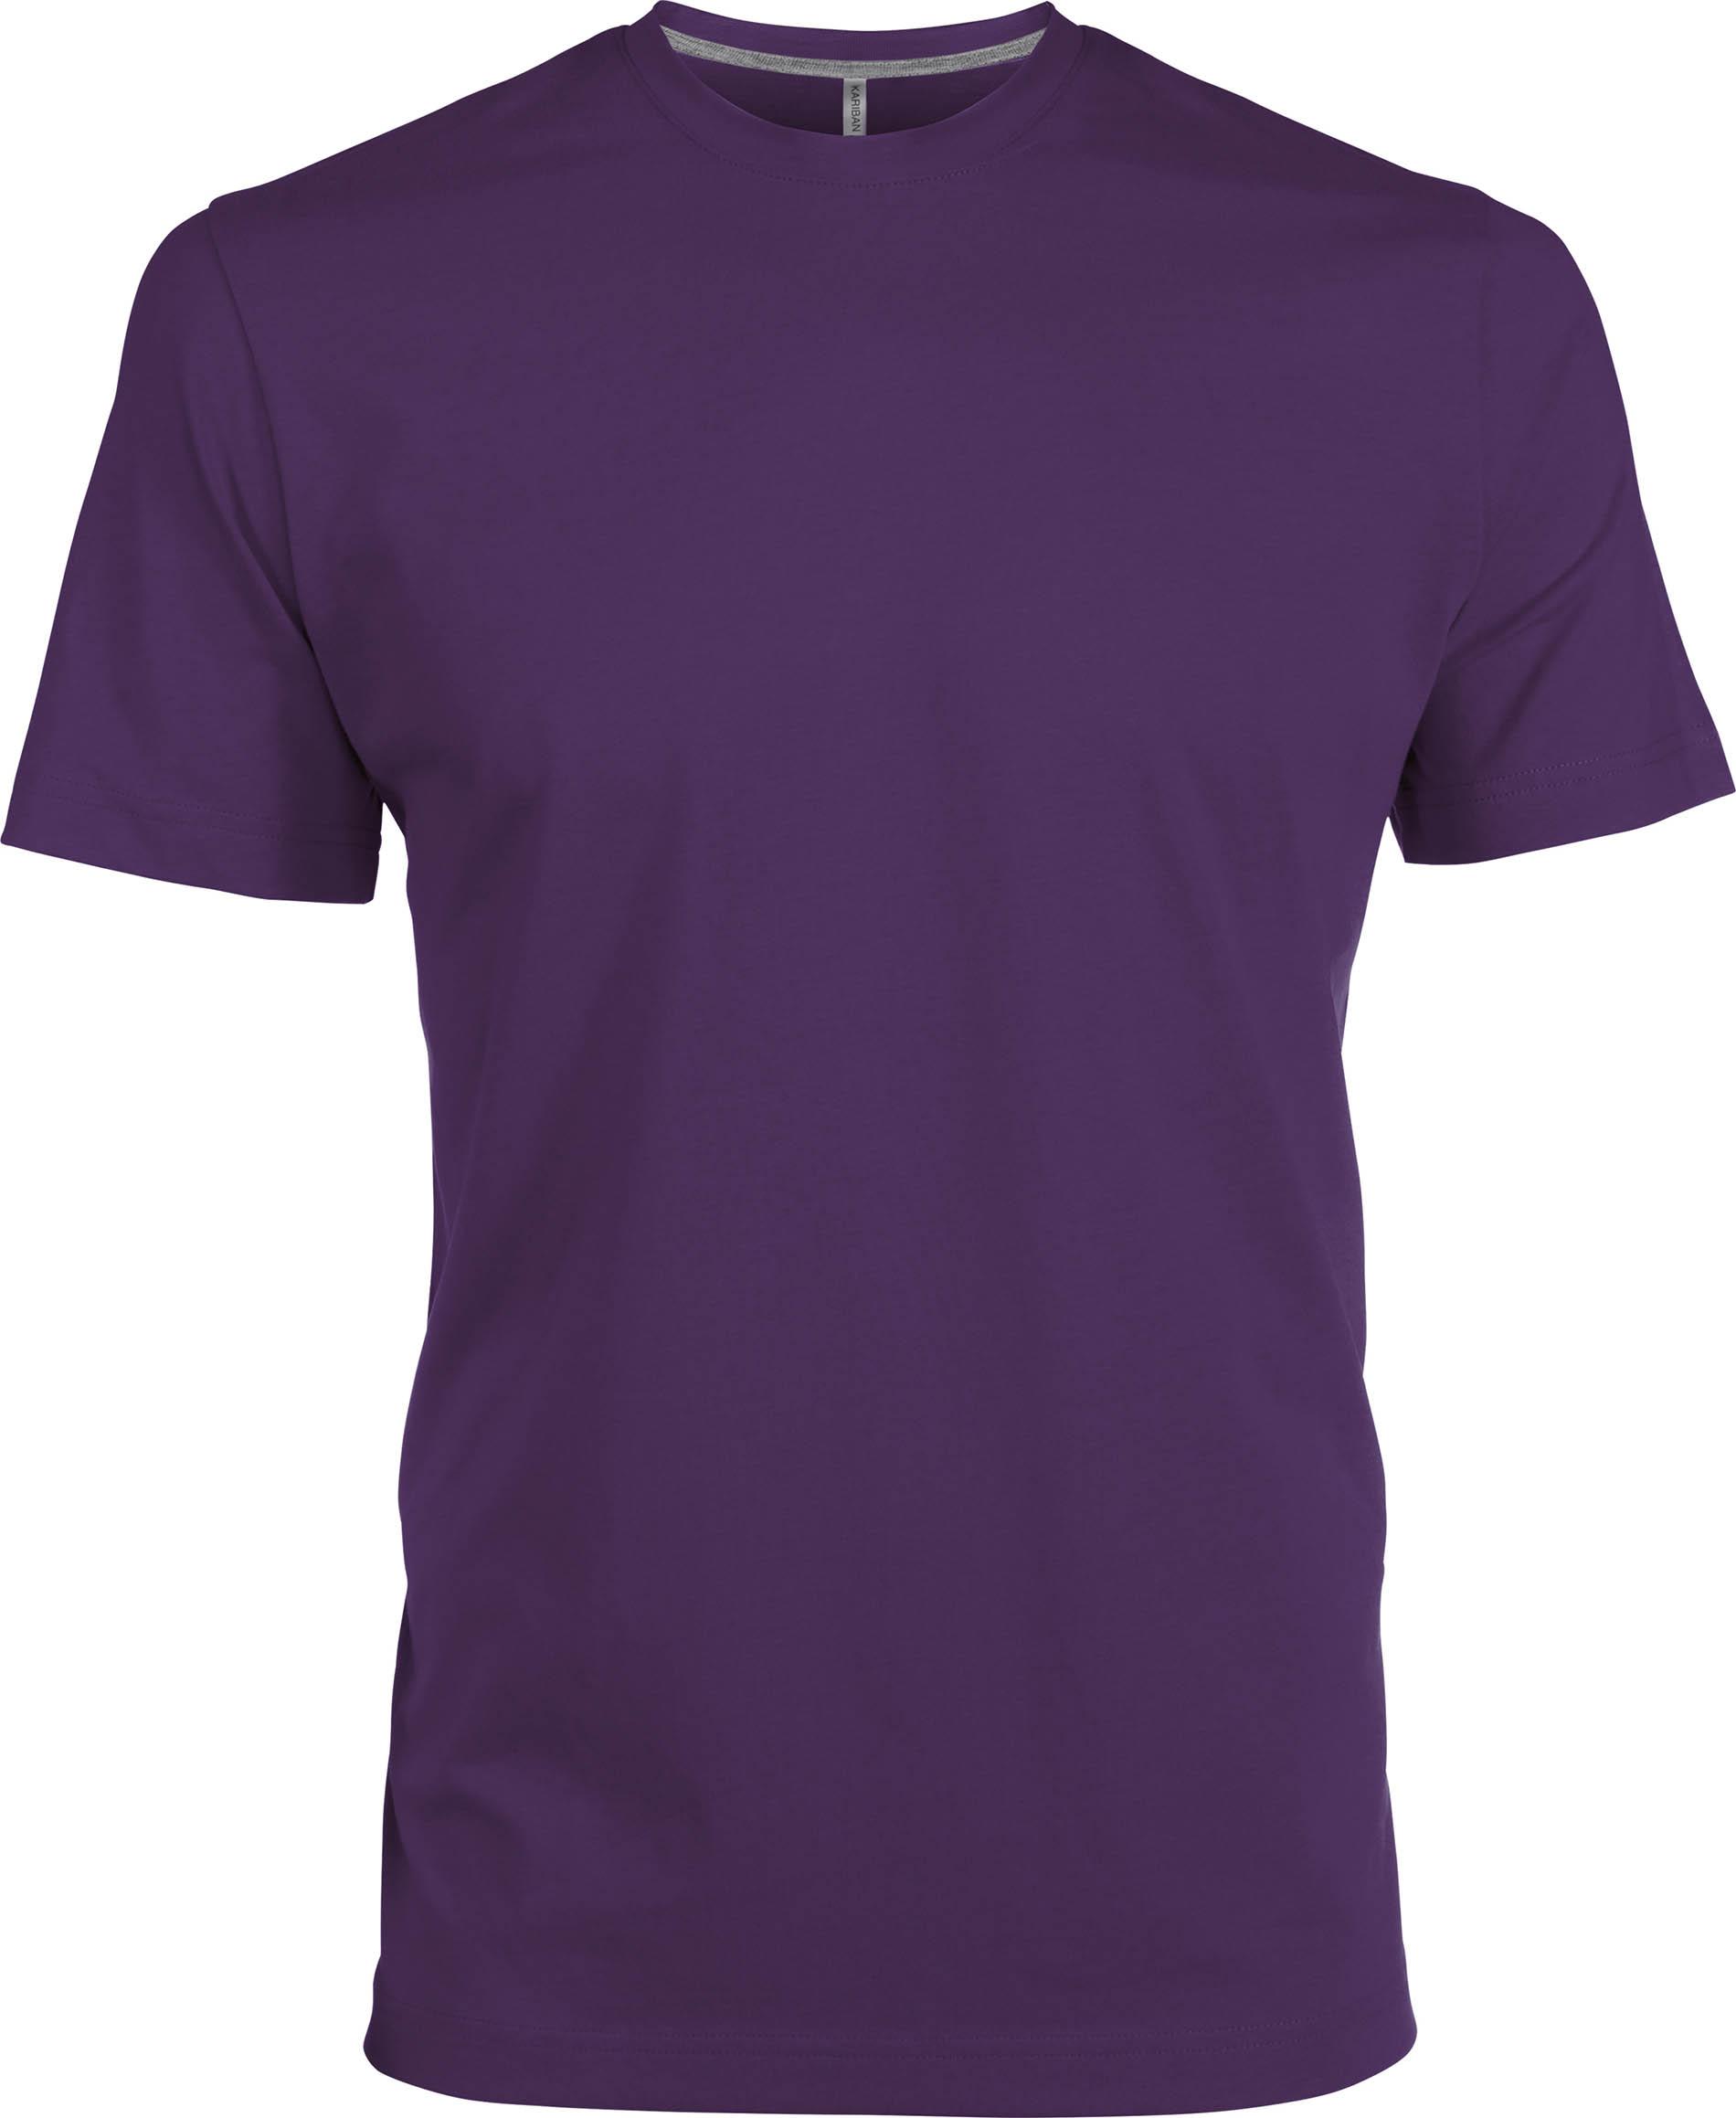 T-paita K356 Violetti